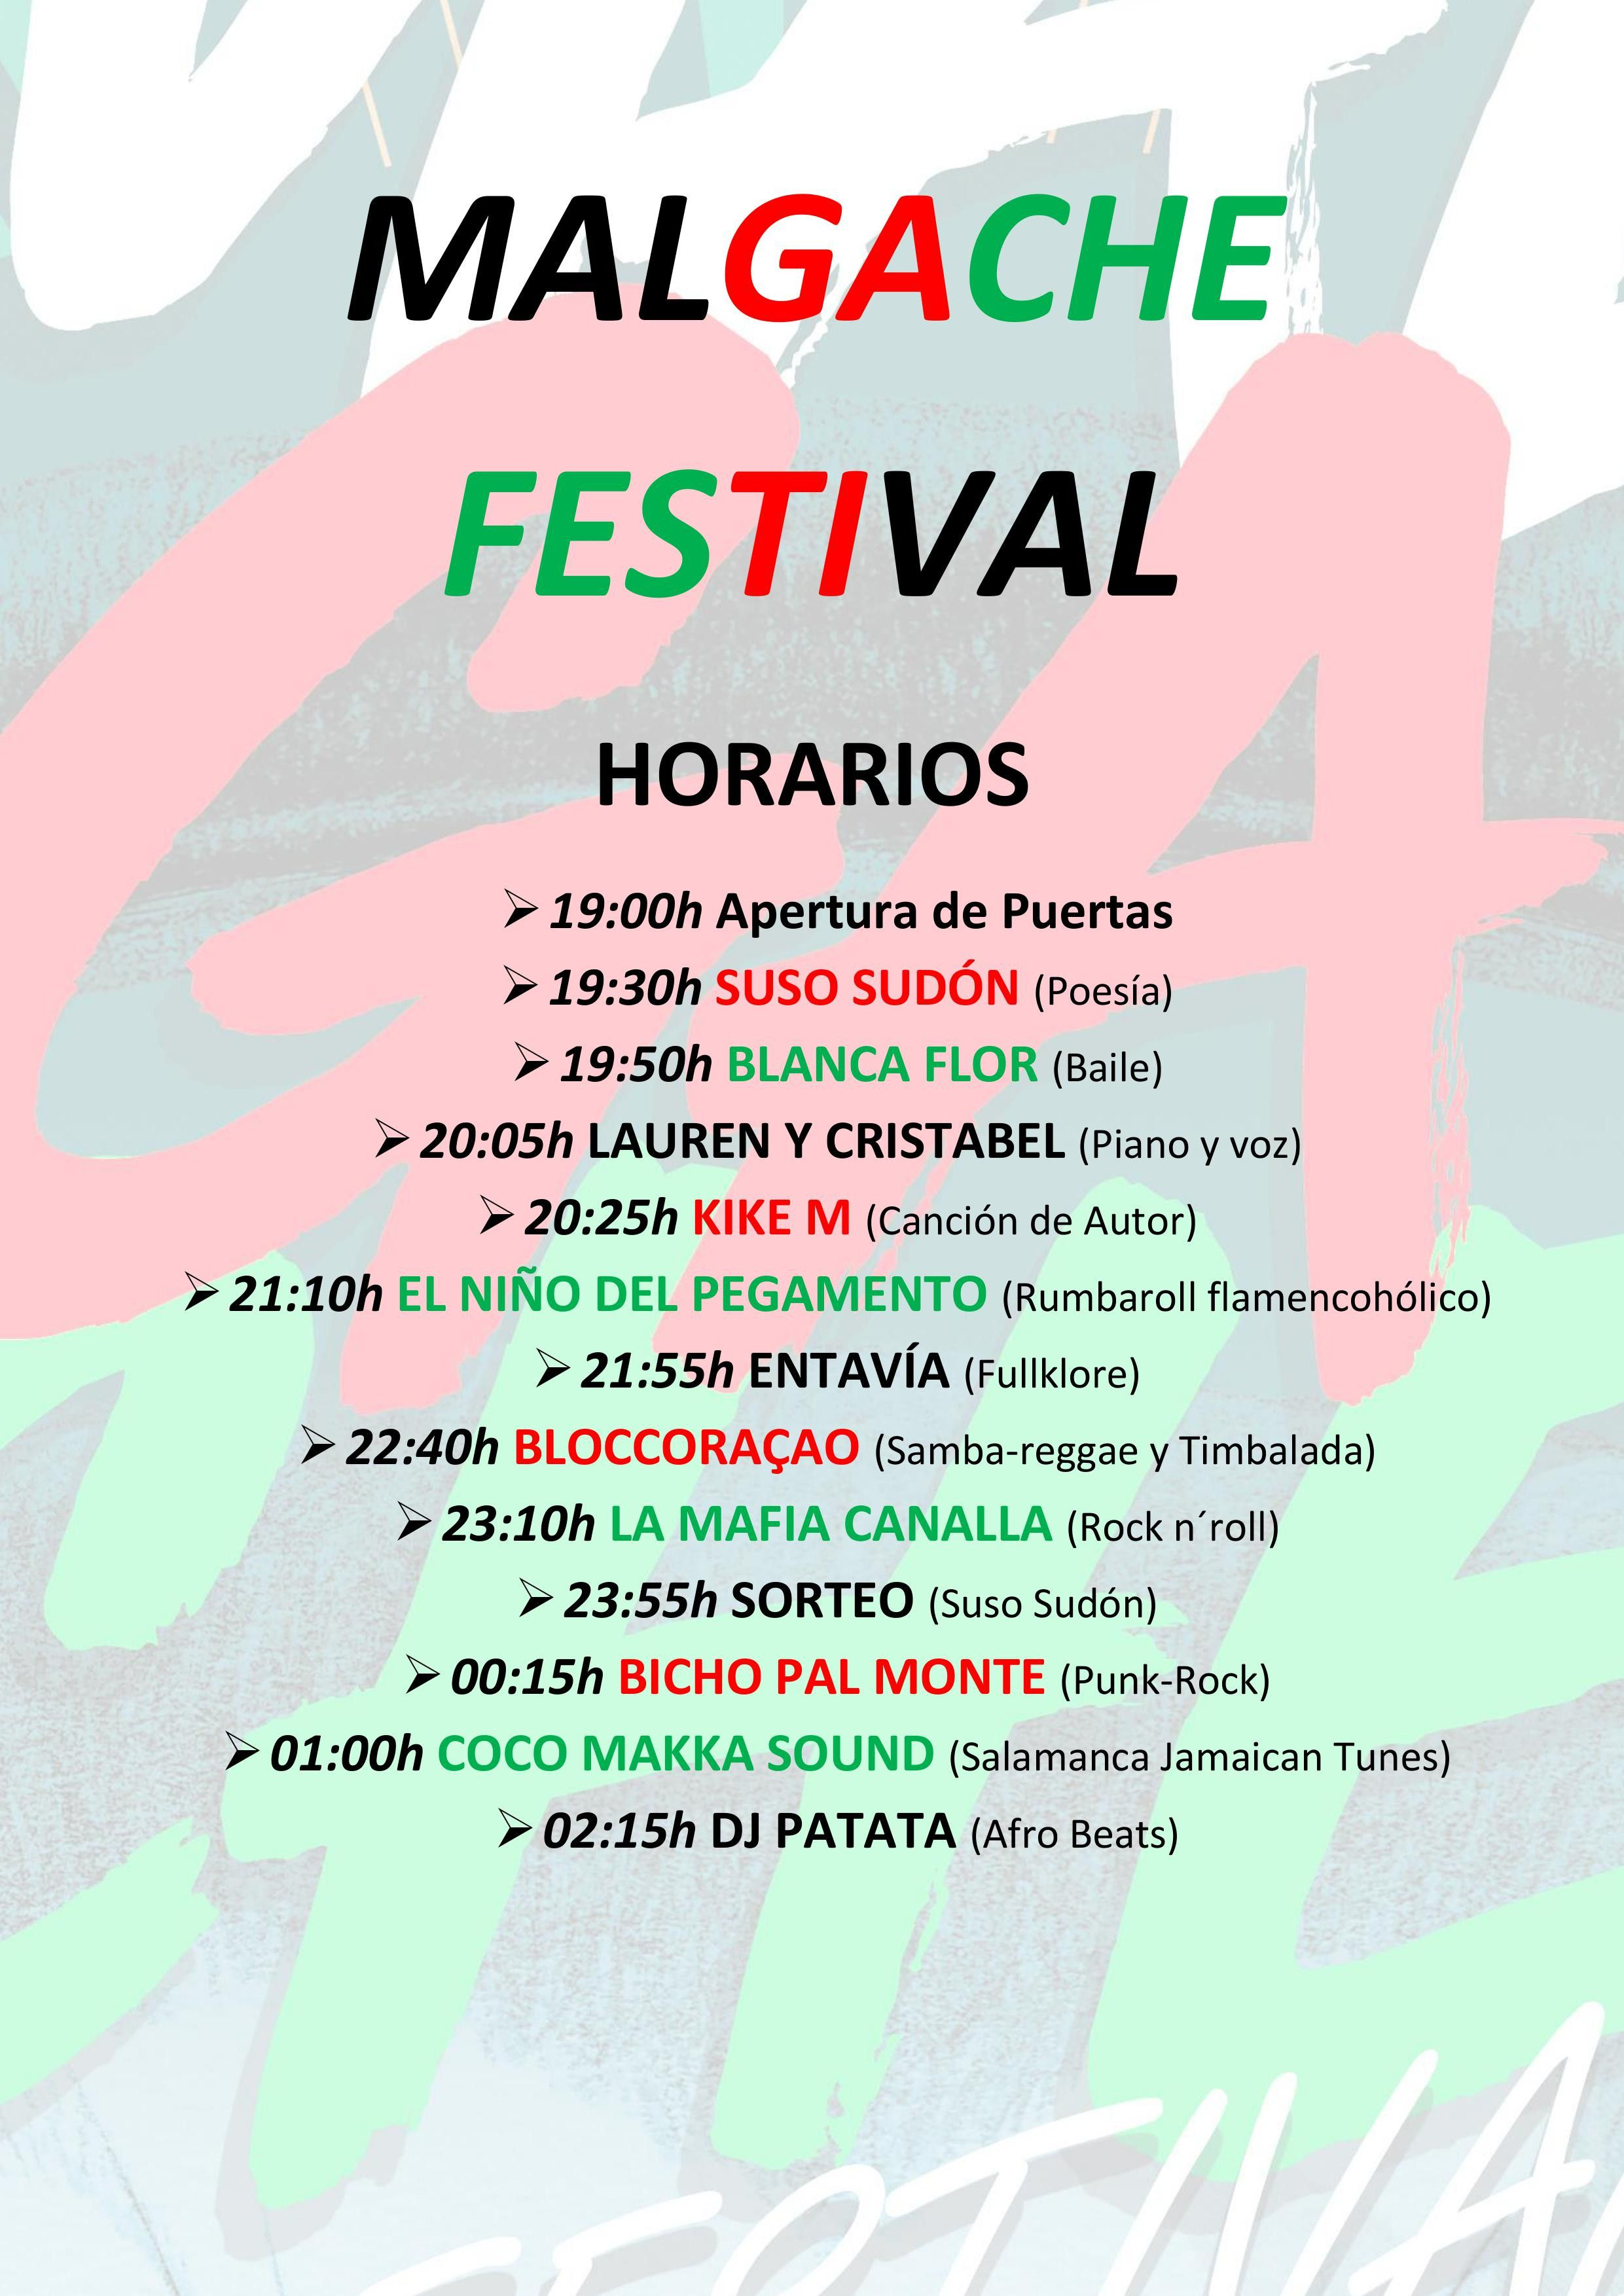 Horario Malgache Festival